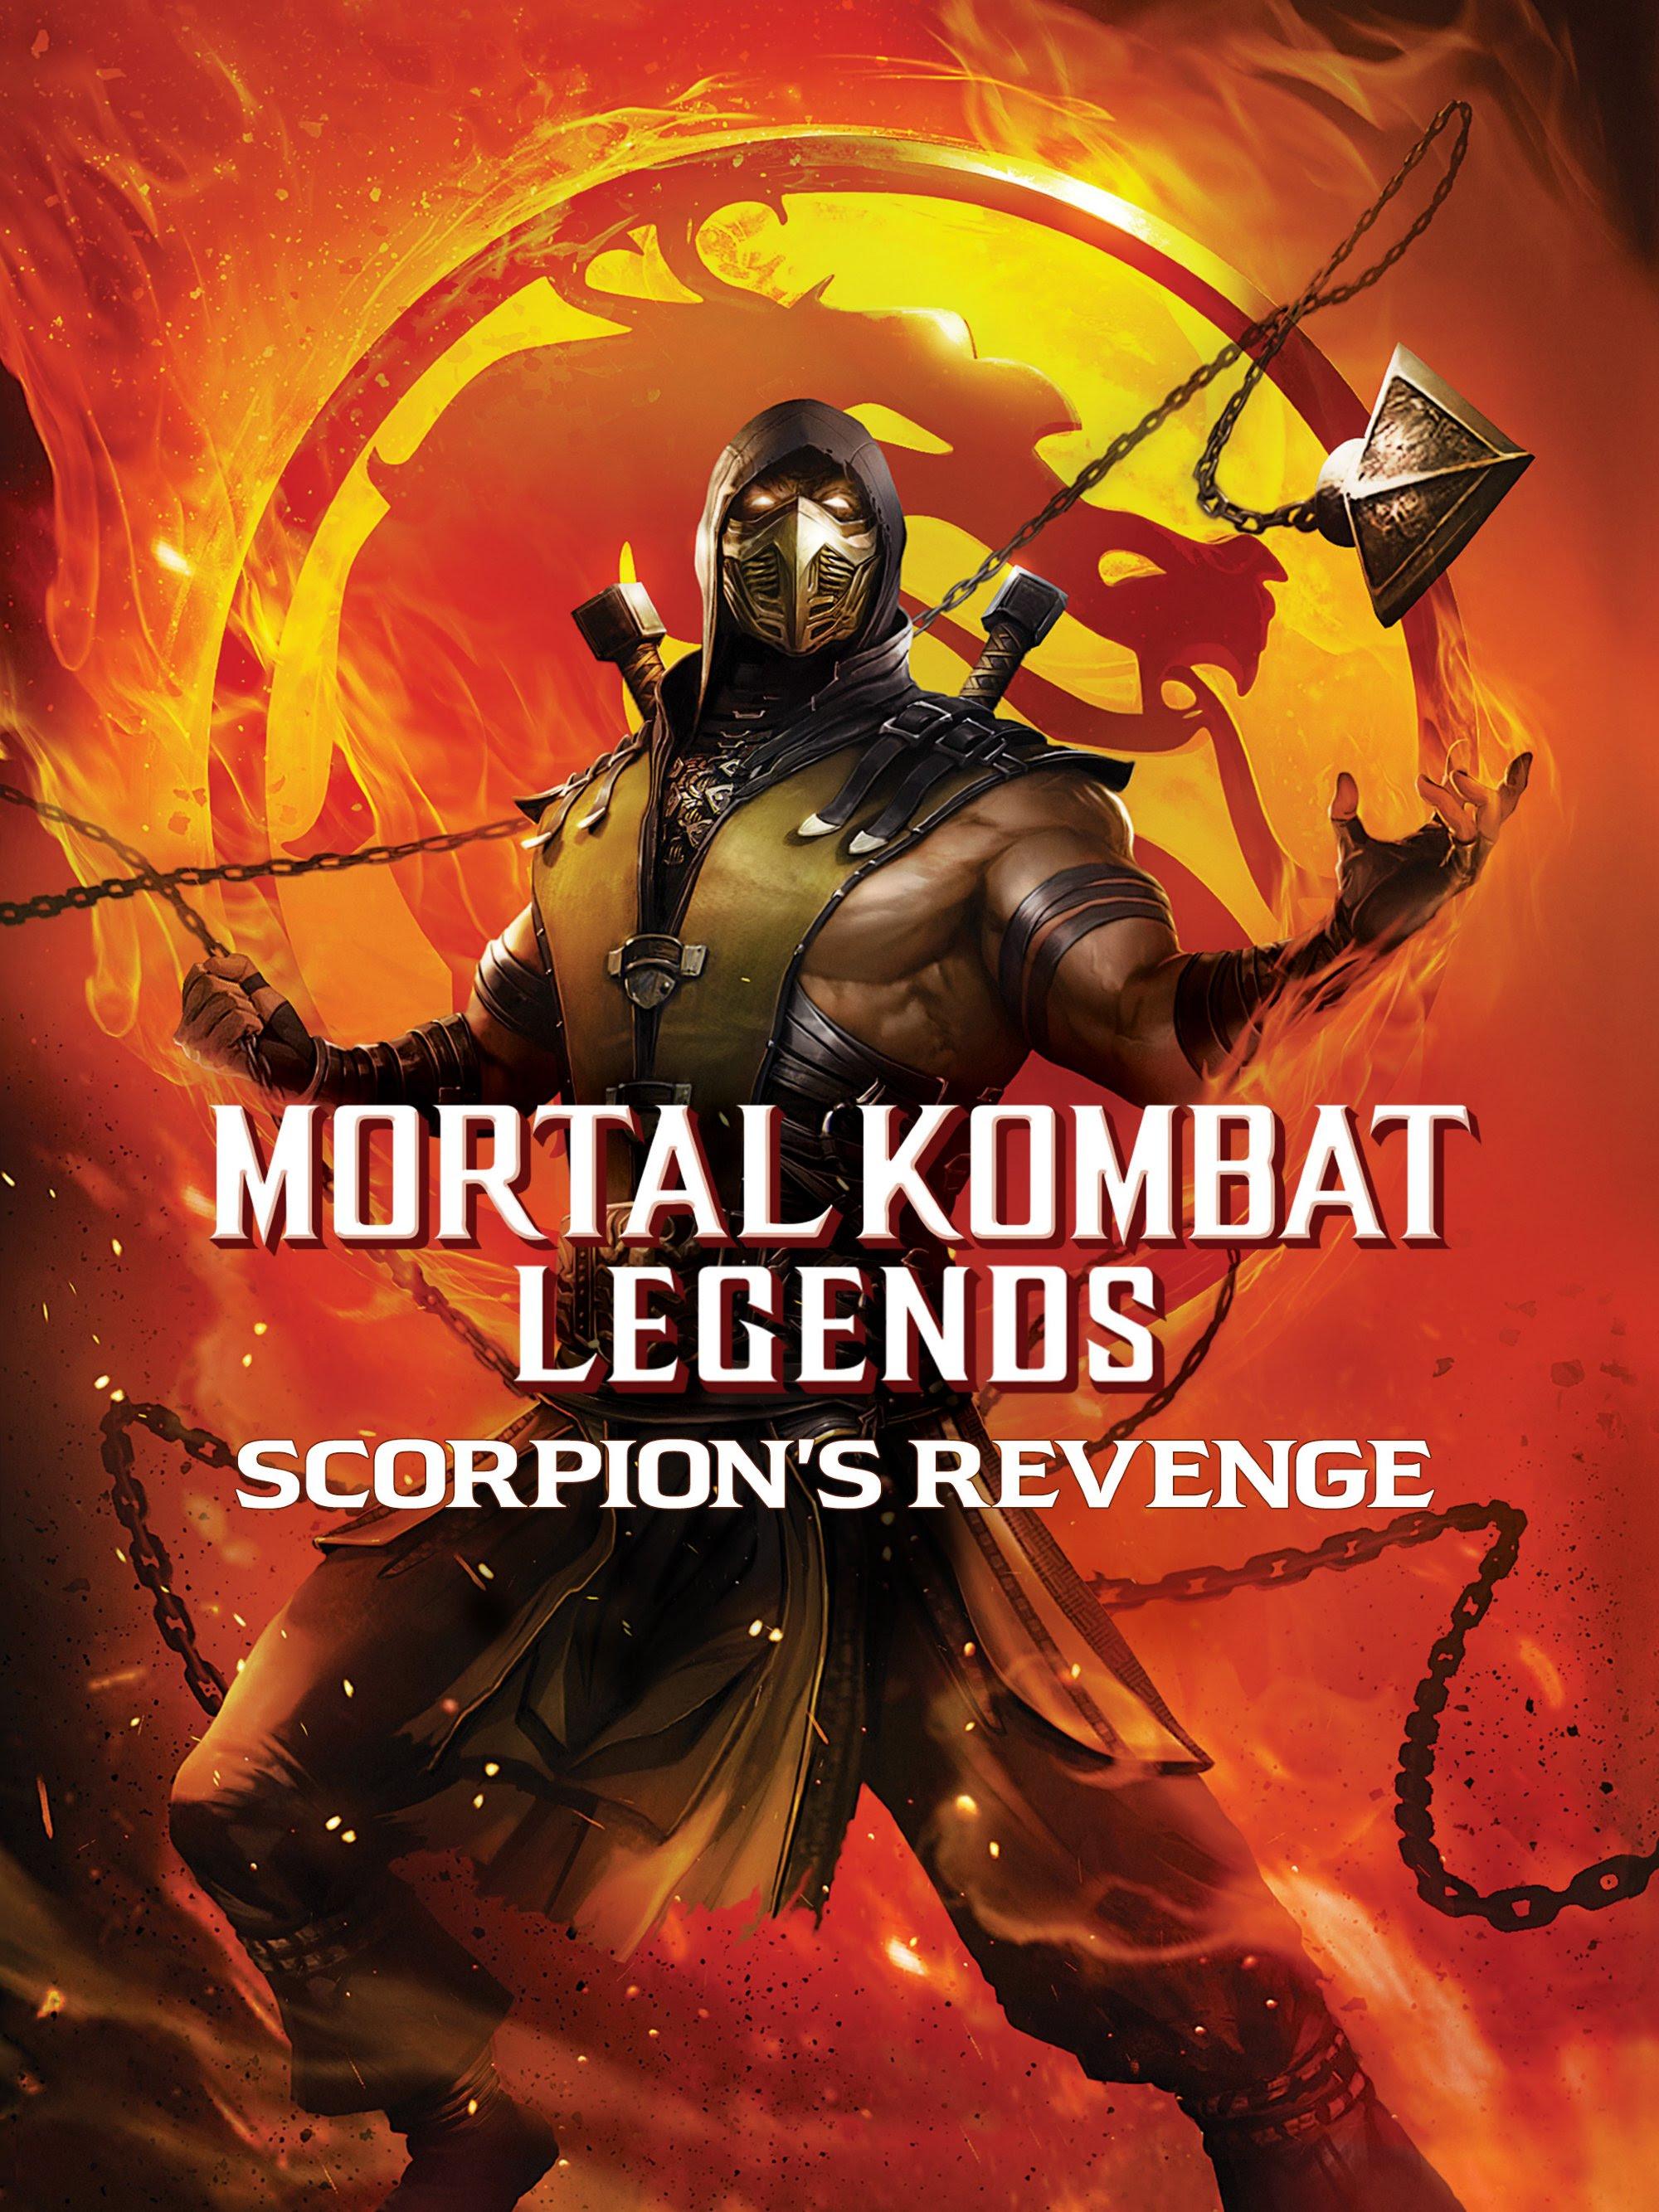 Mortal Kombat Legends: Scorpion Revenge review